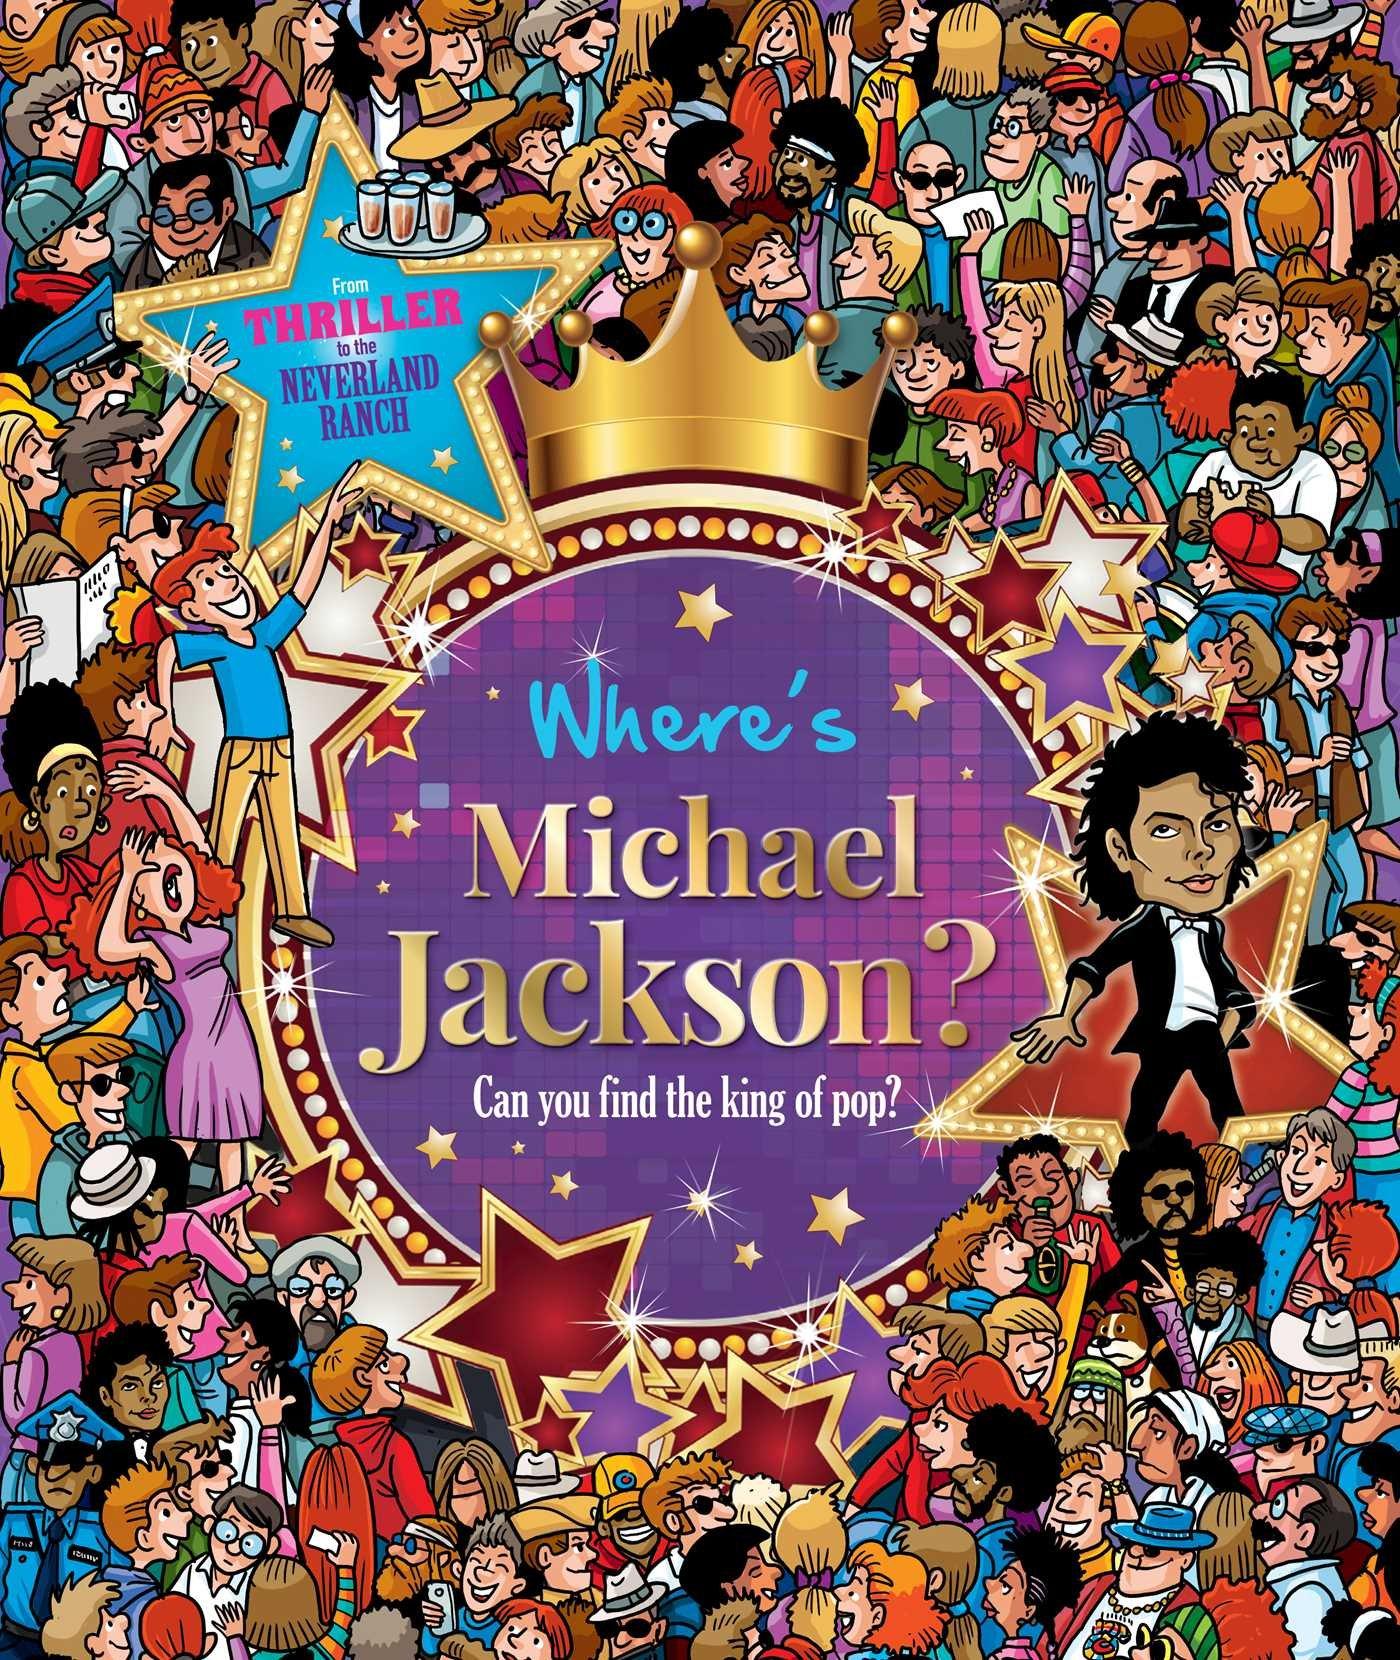 Sorry Wheres Michael Jackson